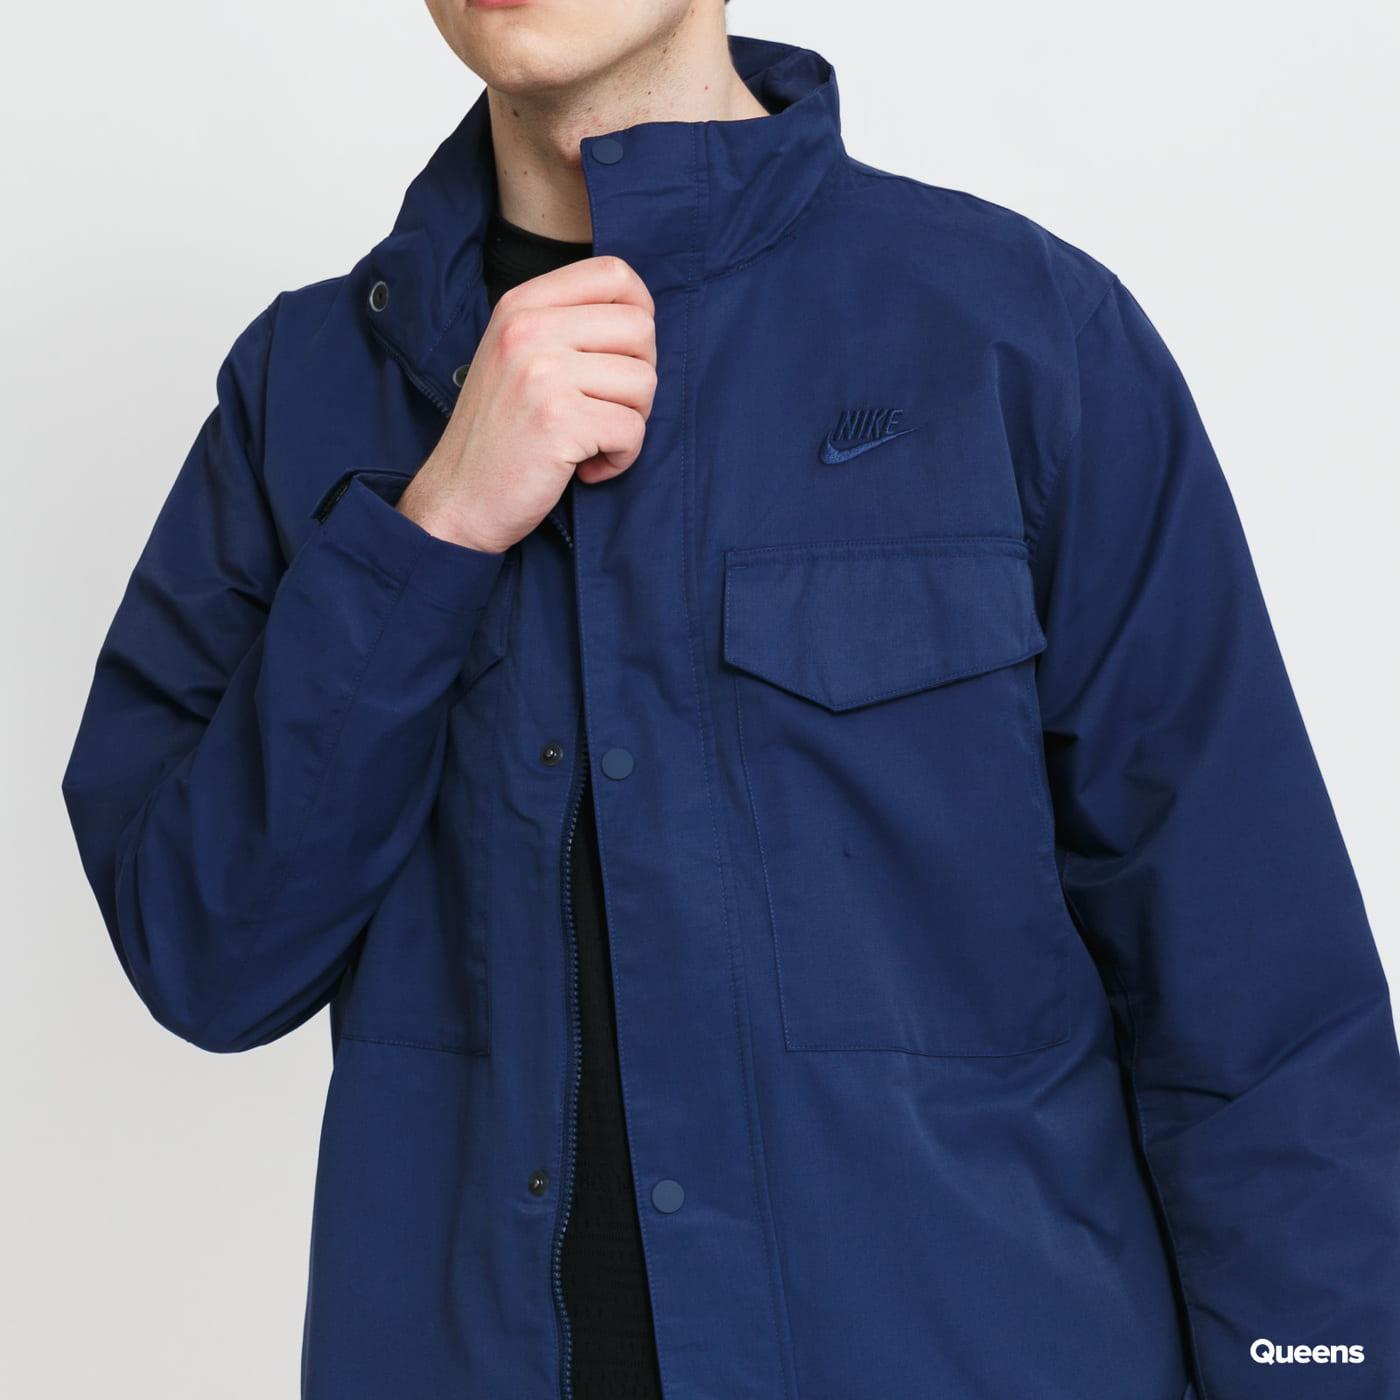 Nike M NSW SPE Woven UL M65 Jacket blue / turquoise